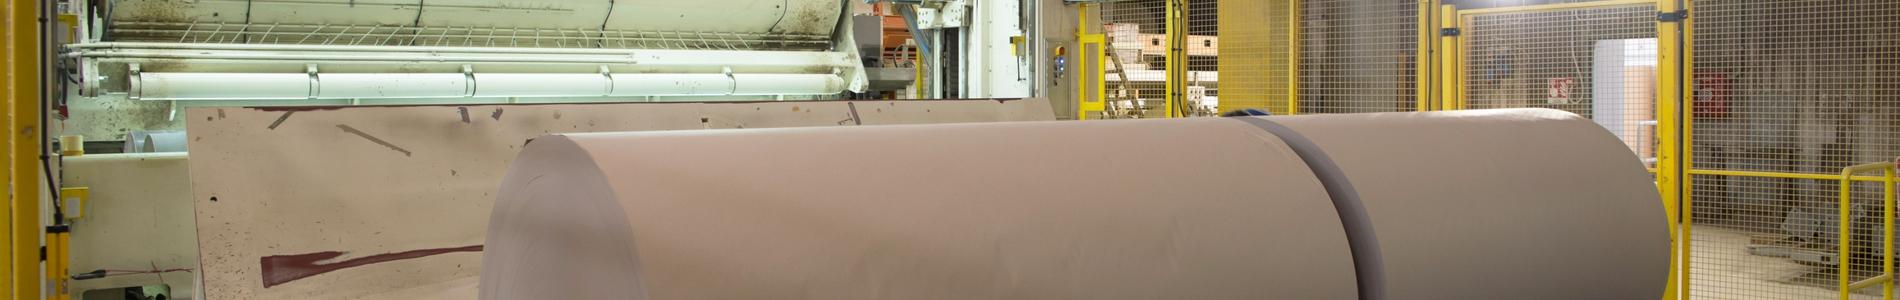 Papier- & Zellulose-Industrie / Paper & Pulp Industry